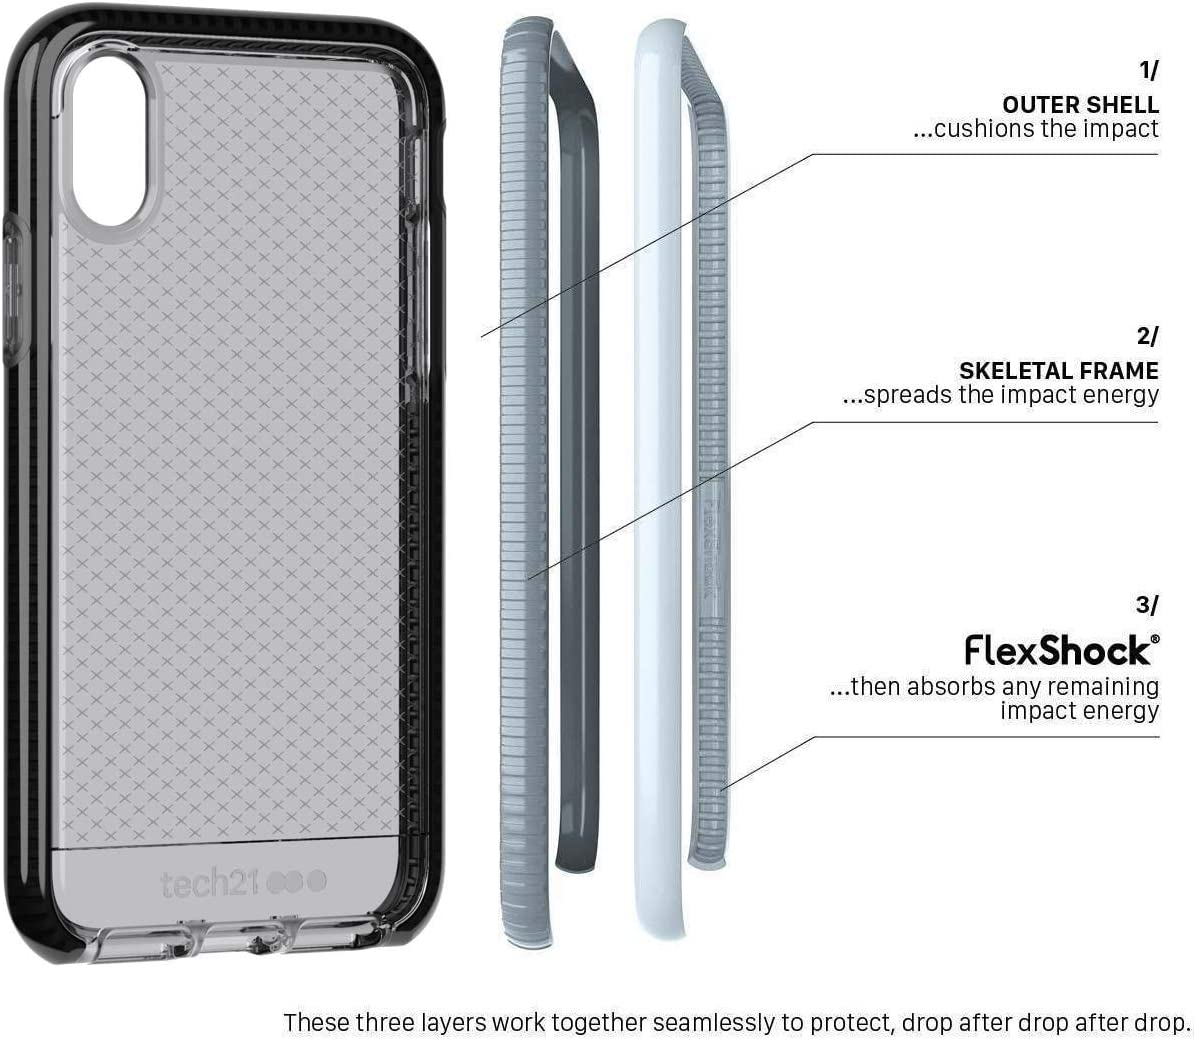 Tech21 Evo Check Schutzhülle für Apple iPhone X/iPhone Xs ...